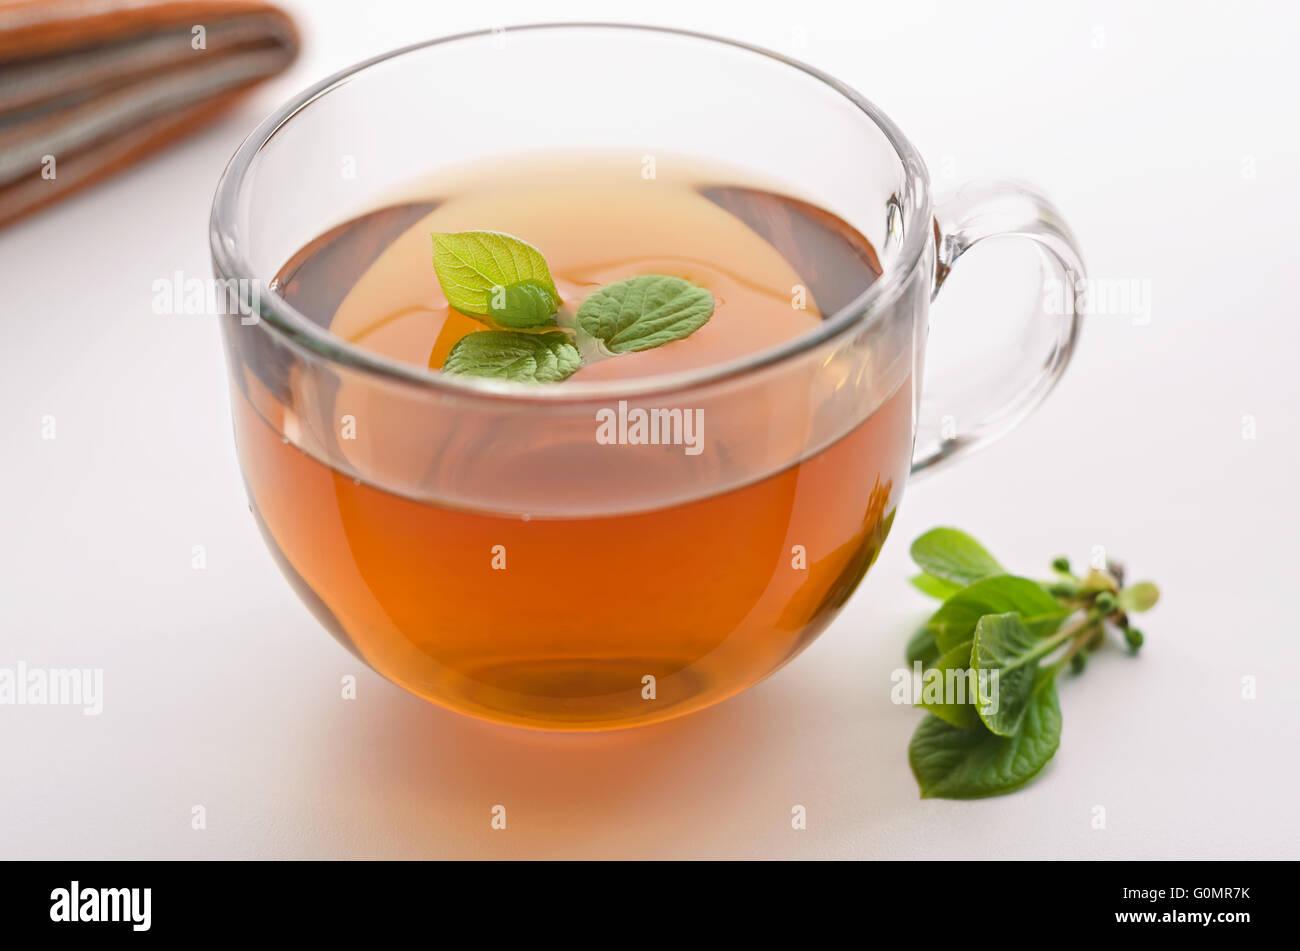 Cup of tea with lemongrass - Stock Image